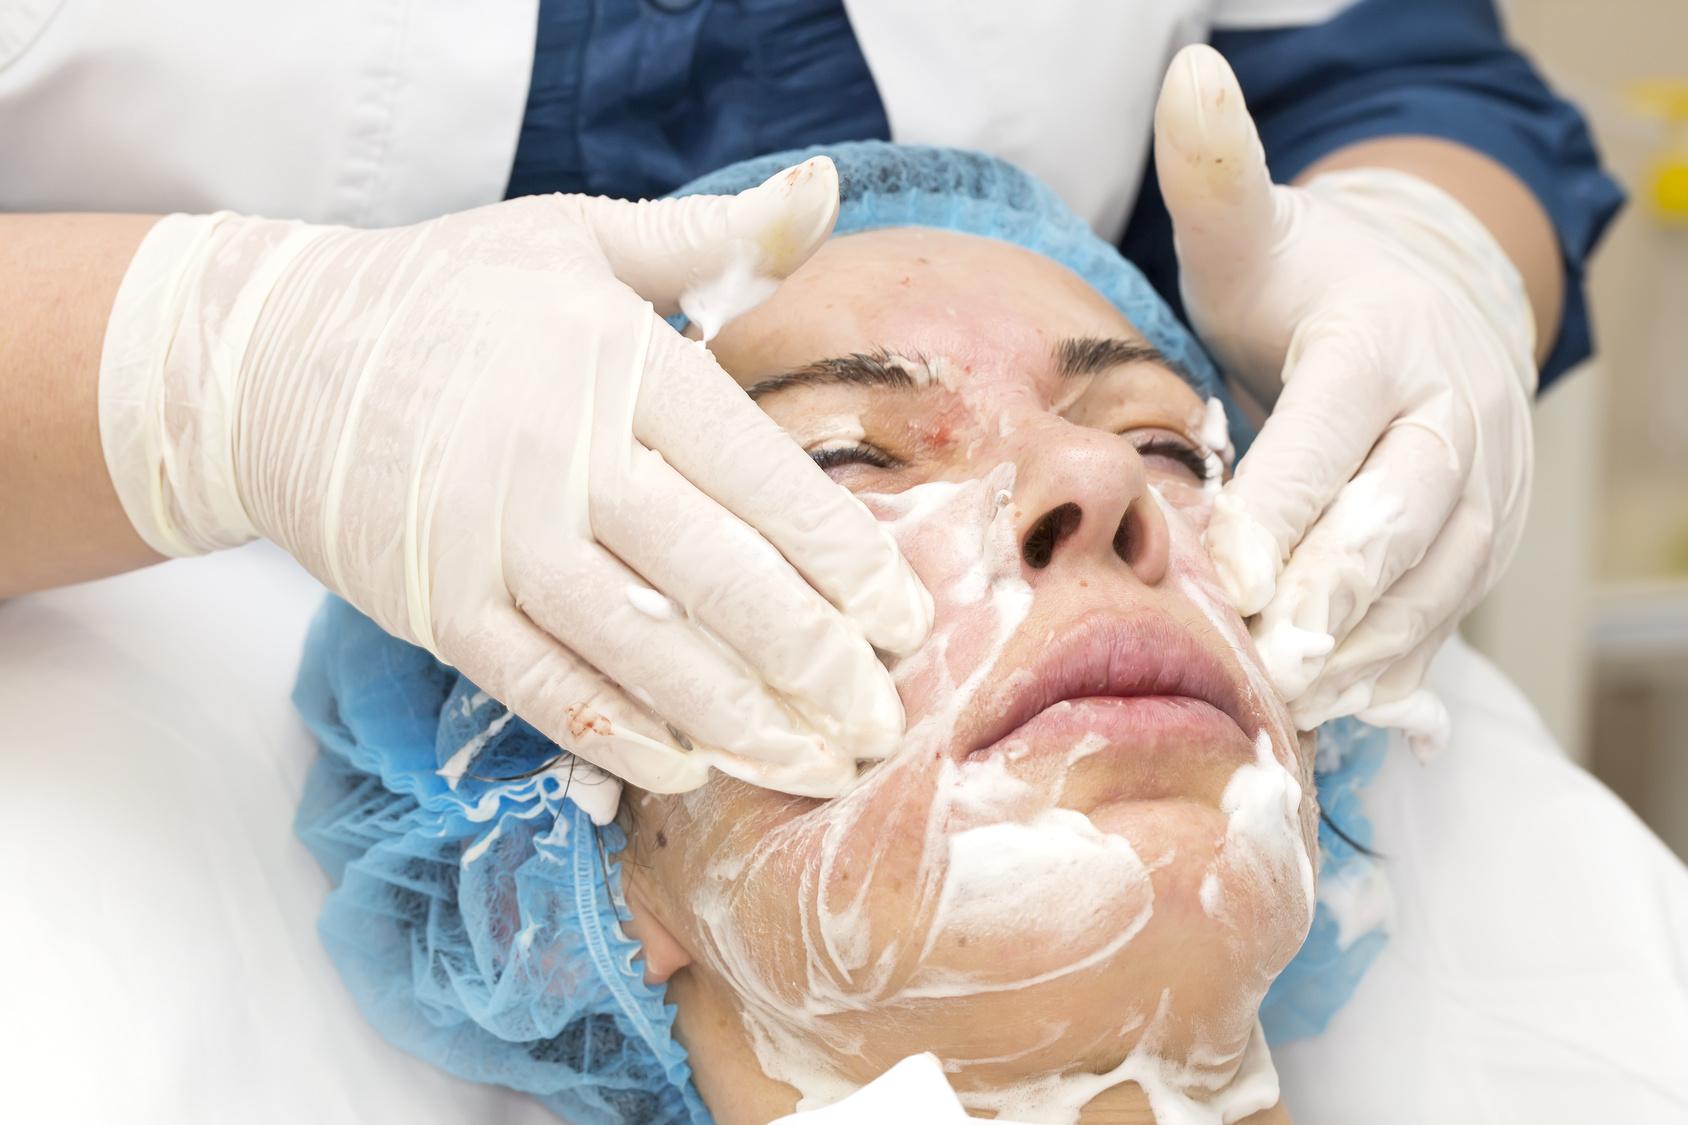 peeling_medico_cicatrices_acne.jpg